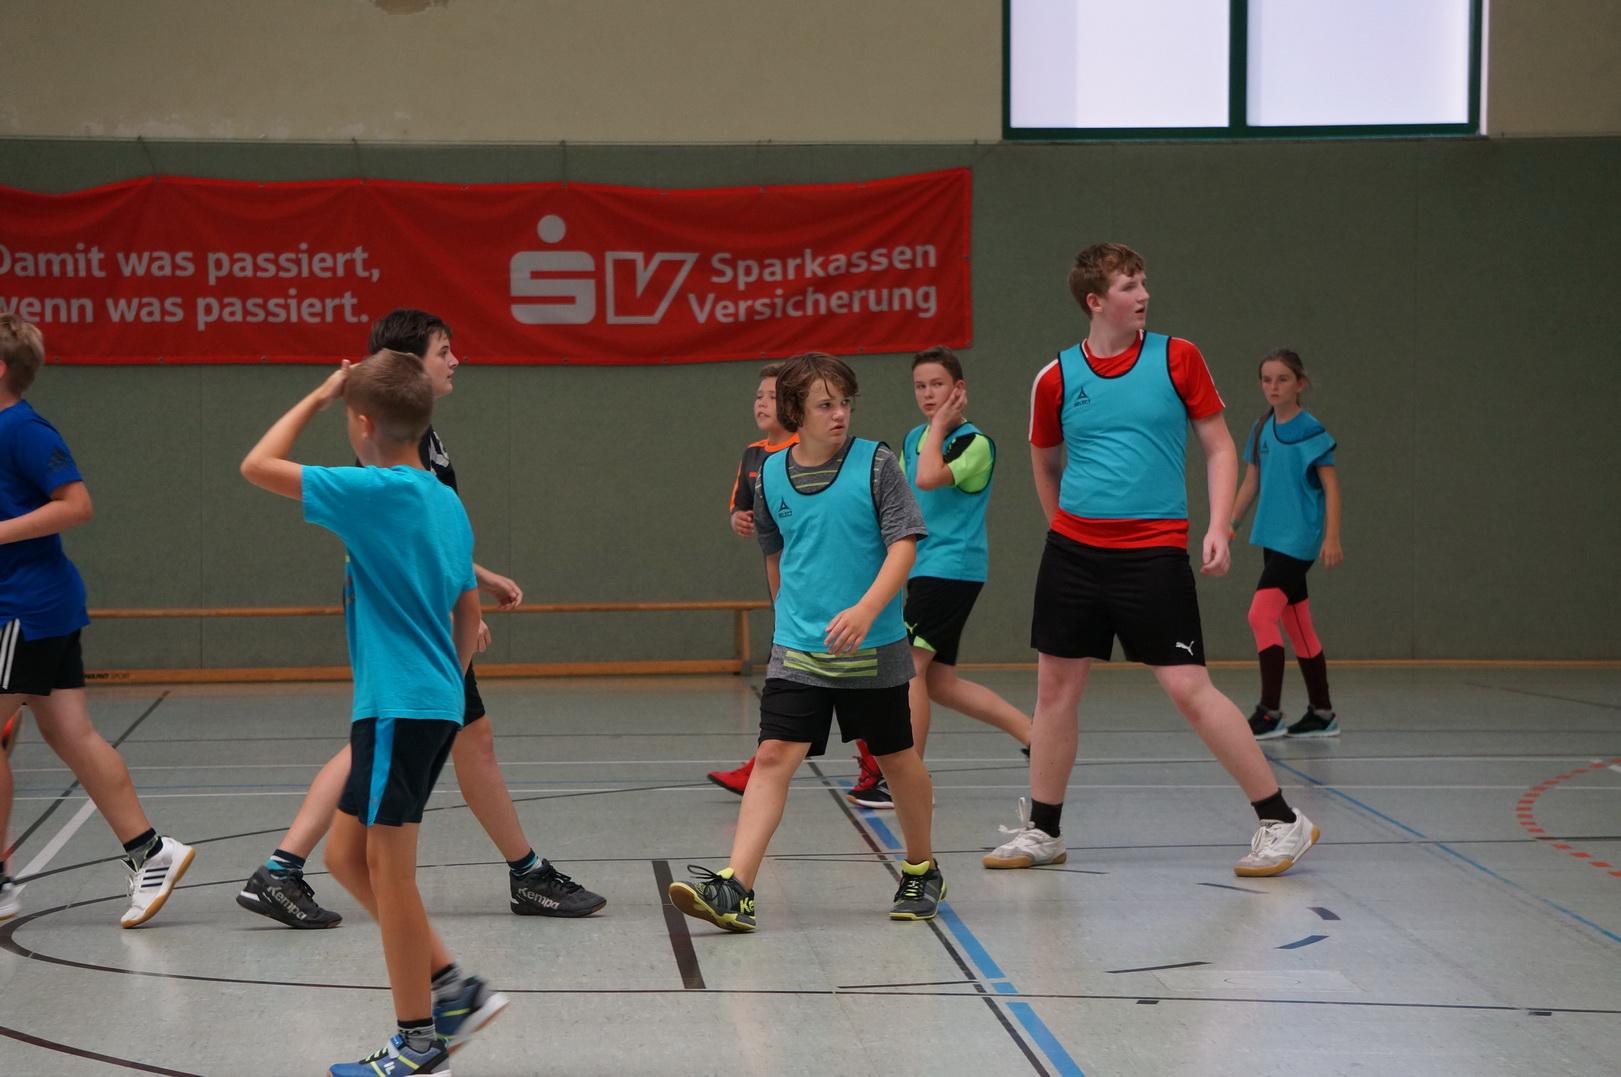 201808_Handballcamp_SDH_MG_105w